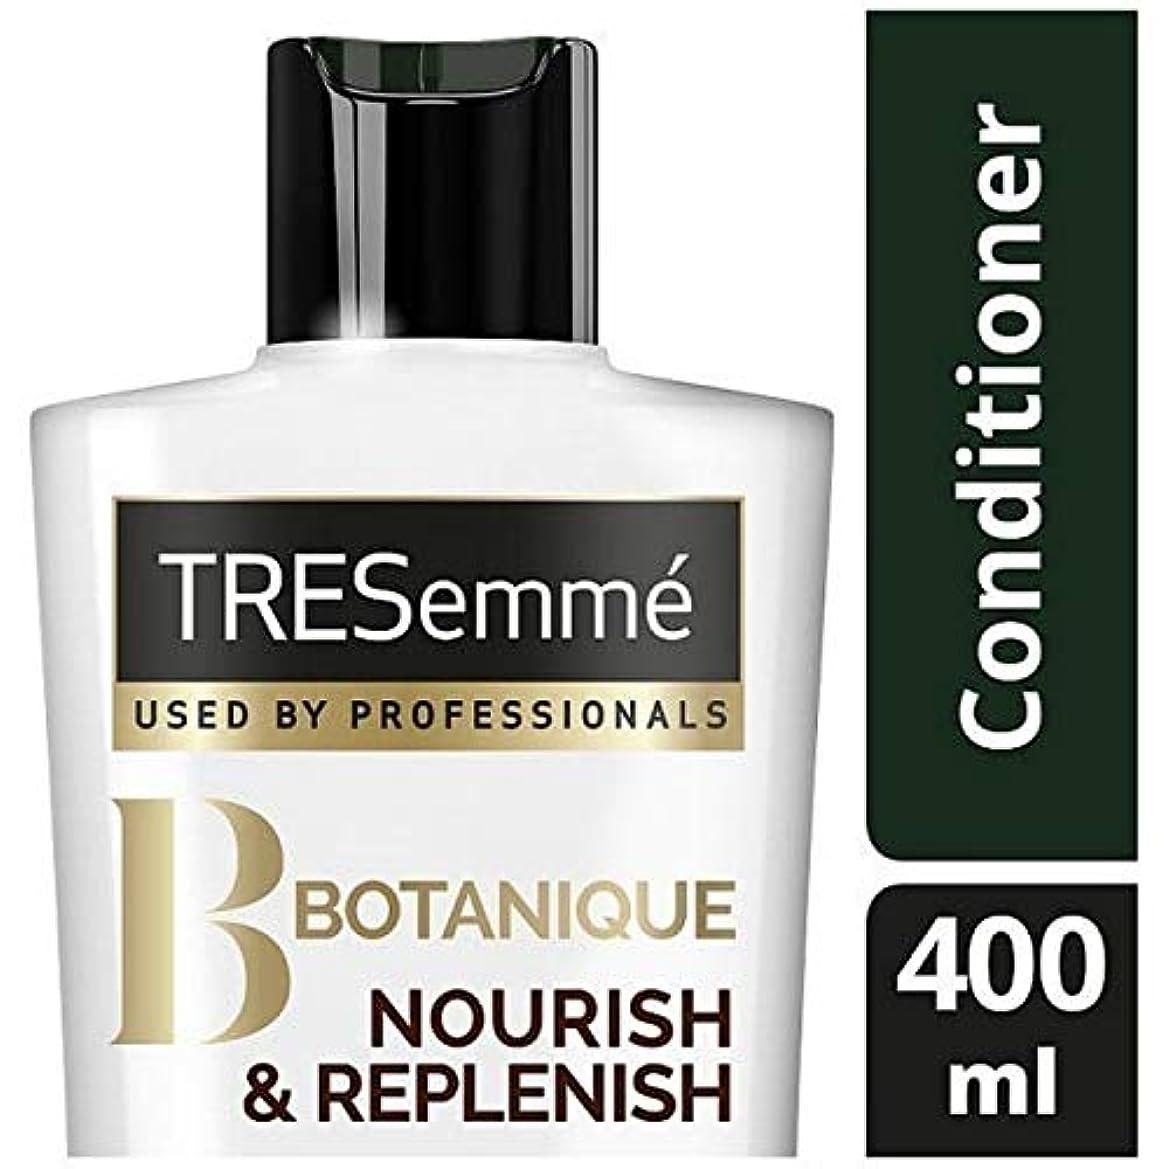 [Tresemme] Tresemmeのボタニックを養う&コンディショナー400ミリリットルを補充します - TRESemme Botanique Nourish & Replenish Conditioner 400ml...